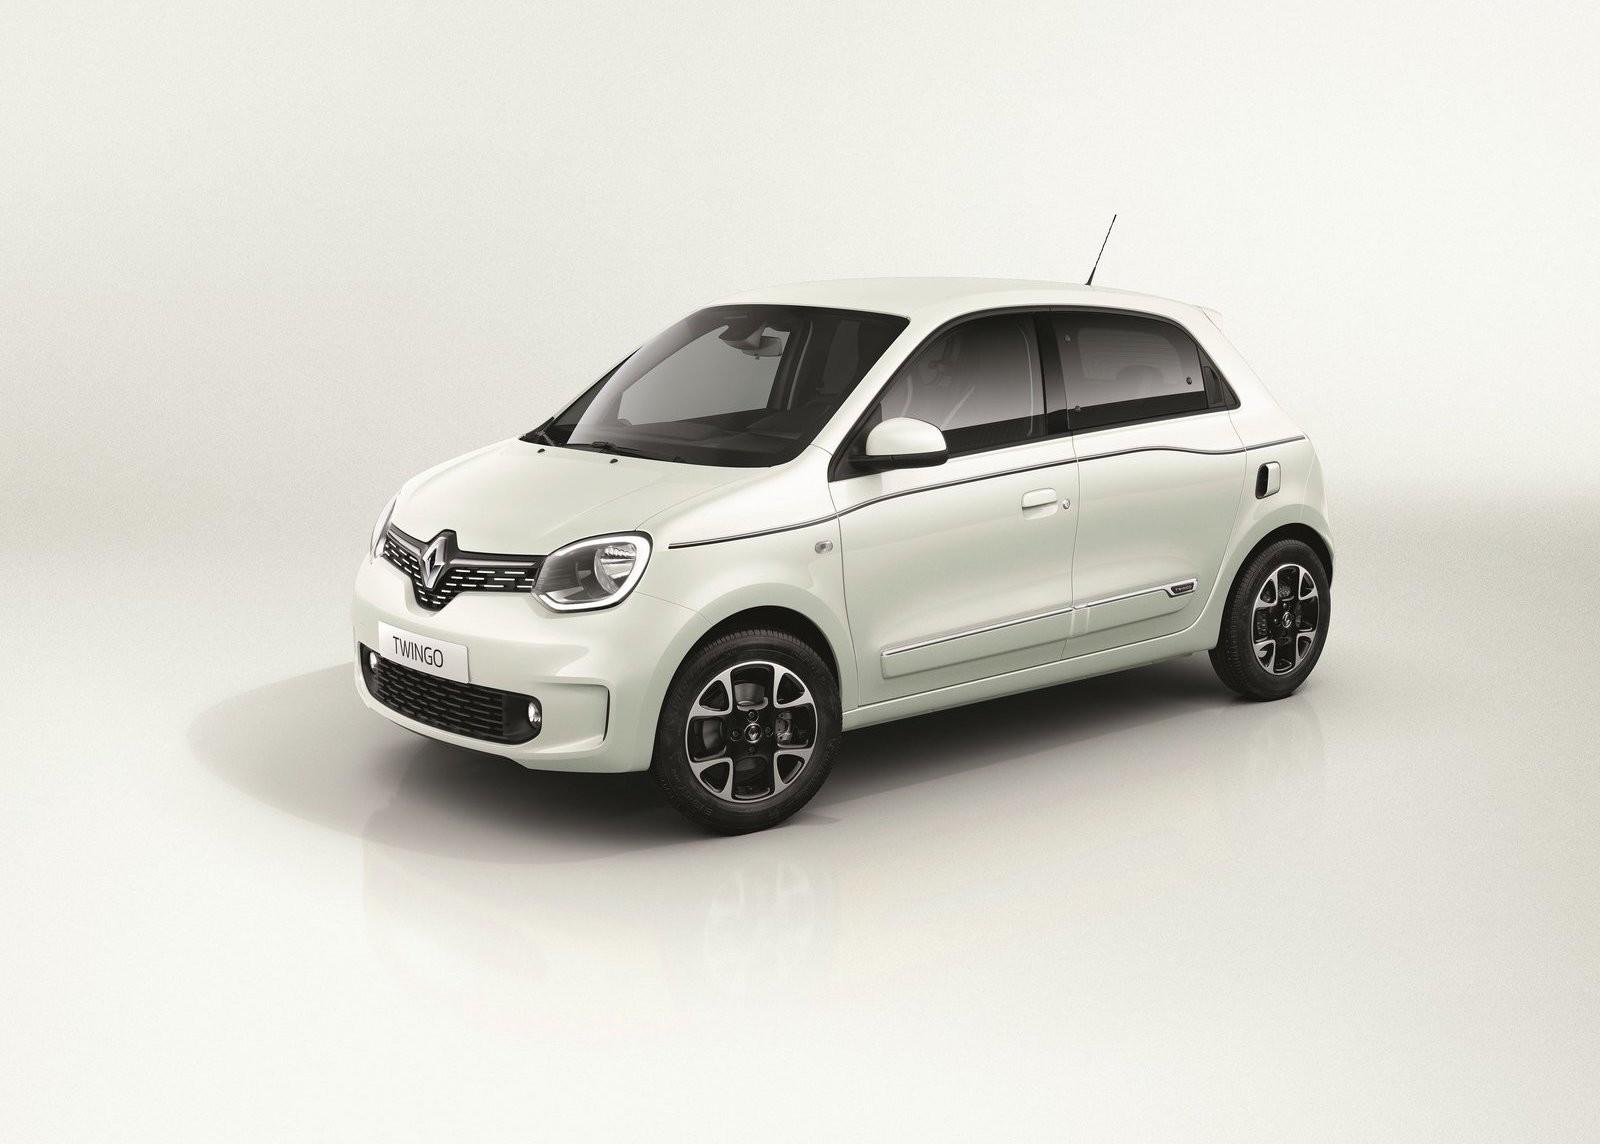 Foto de Renault Twingo 2020 (17/20)